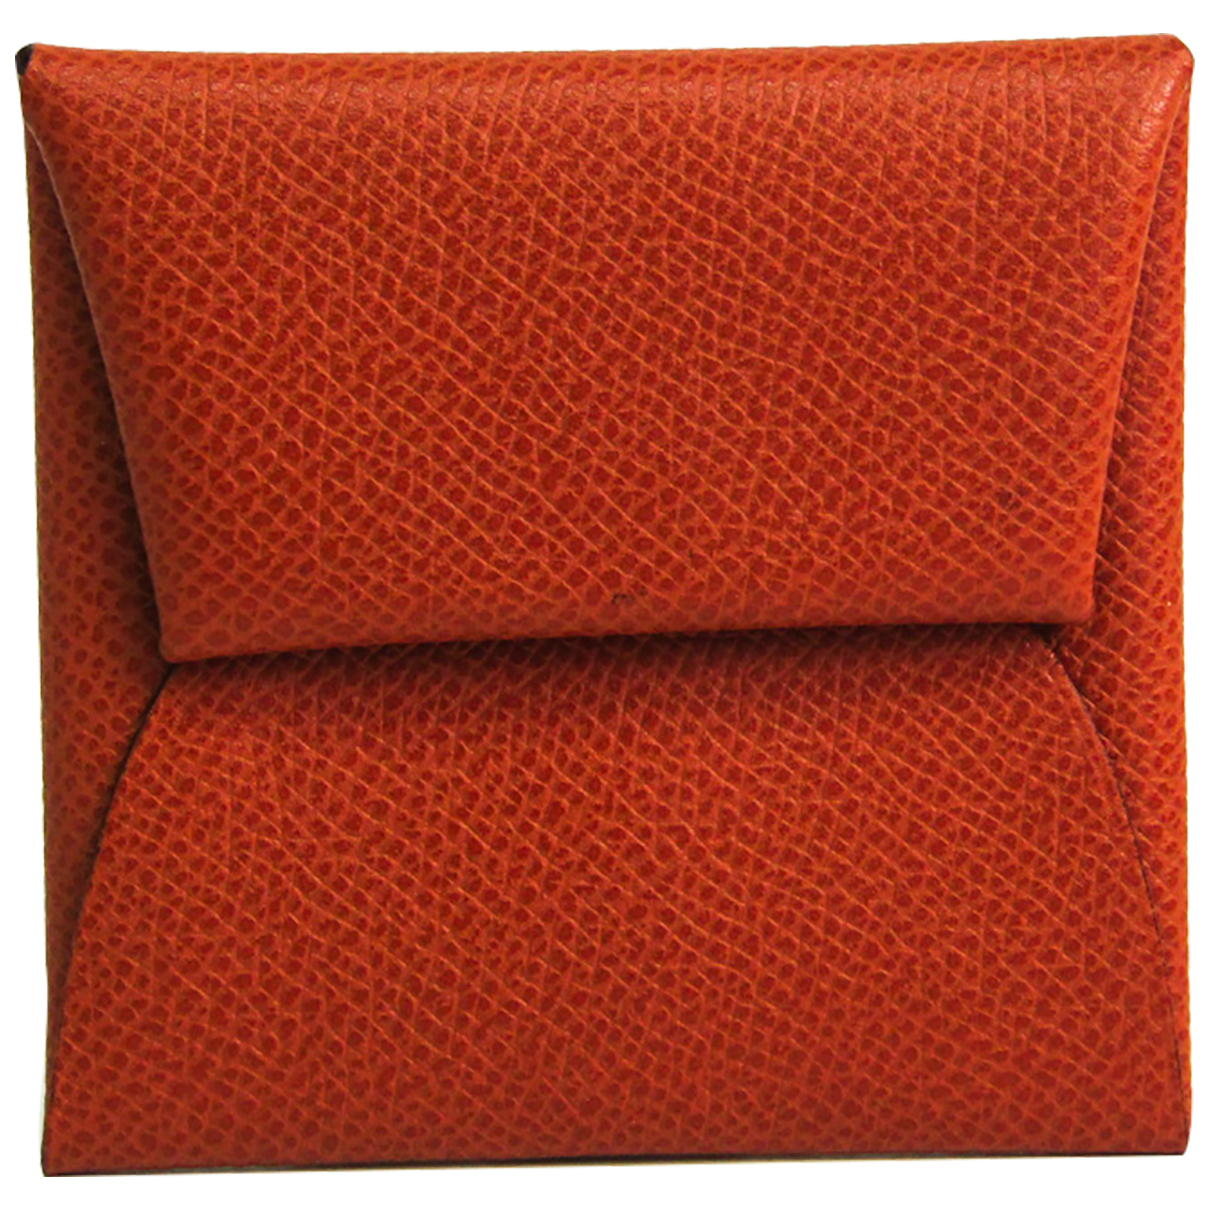 Hermès N Red Leather wallet for Women N